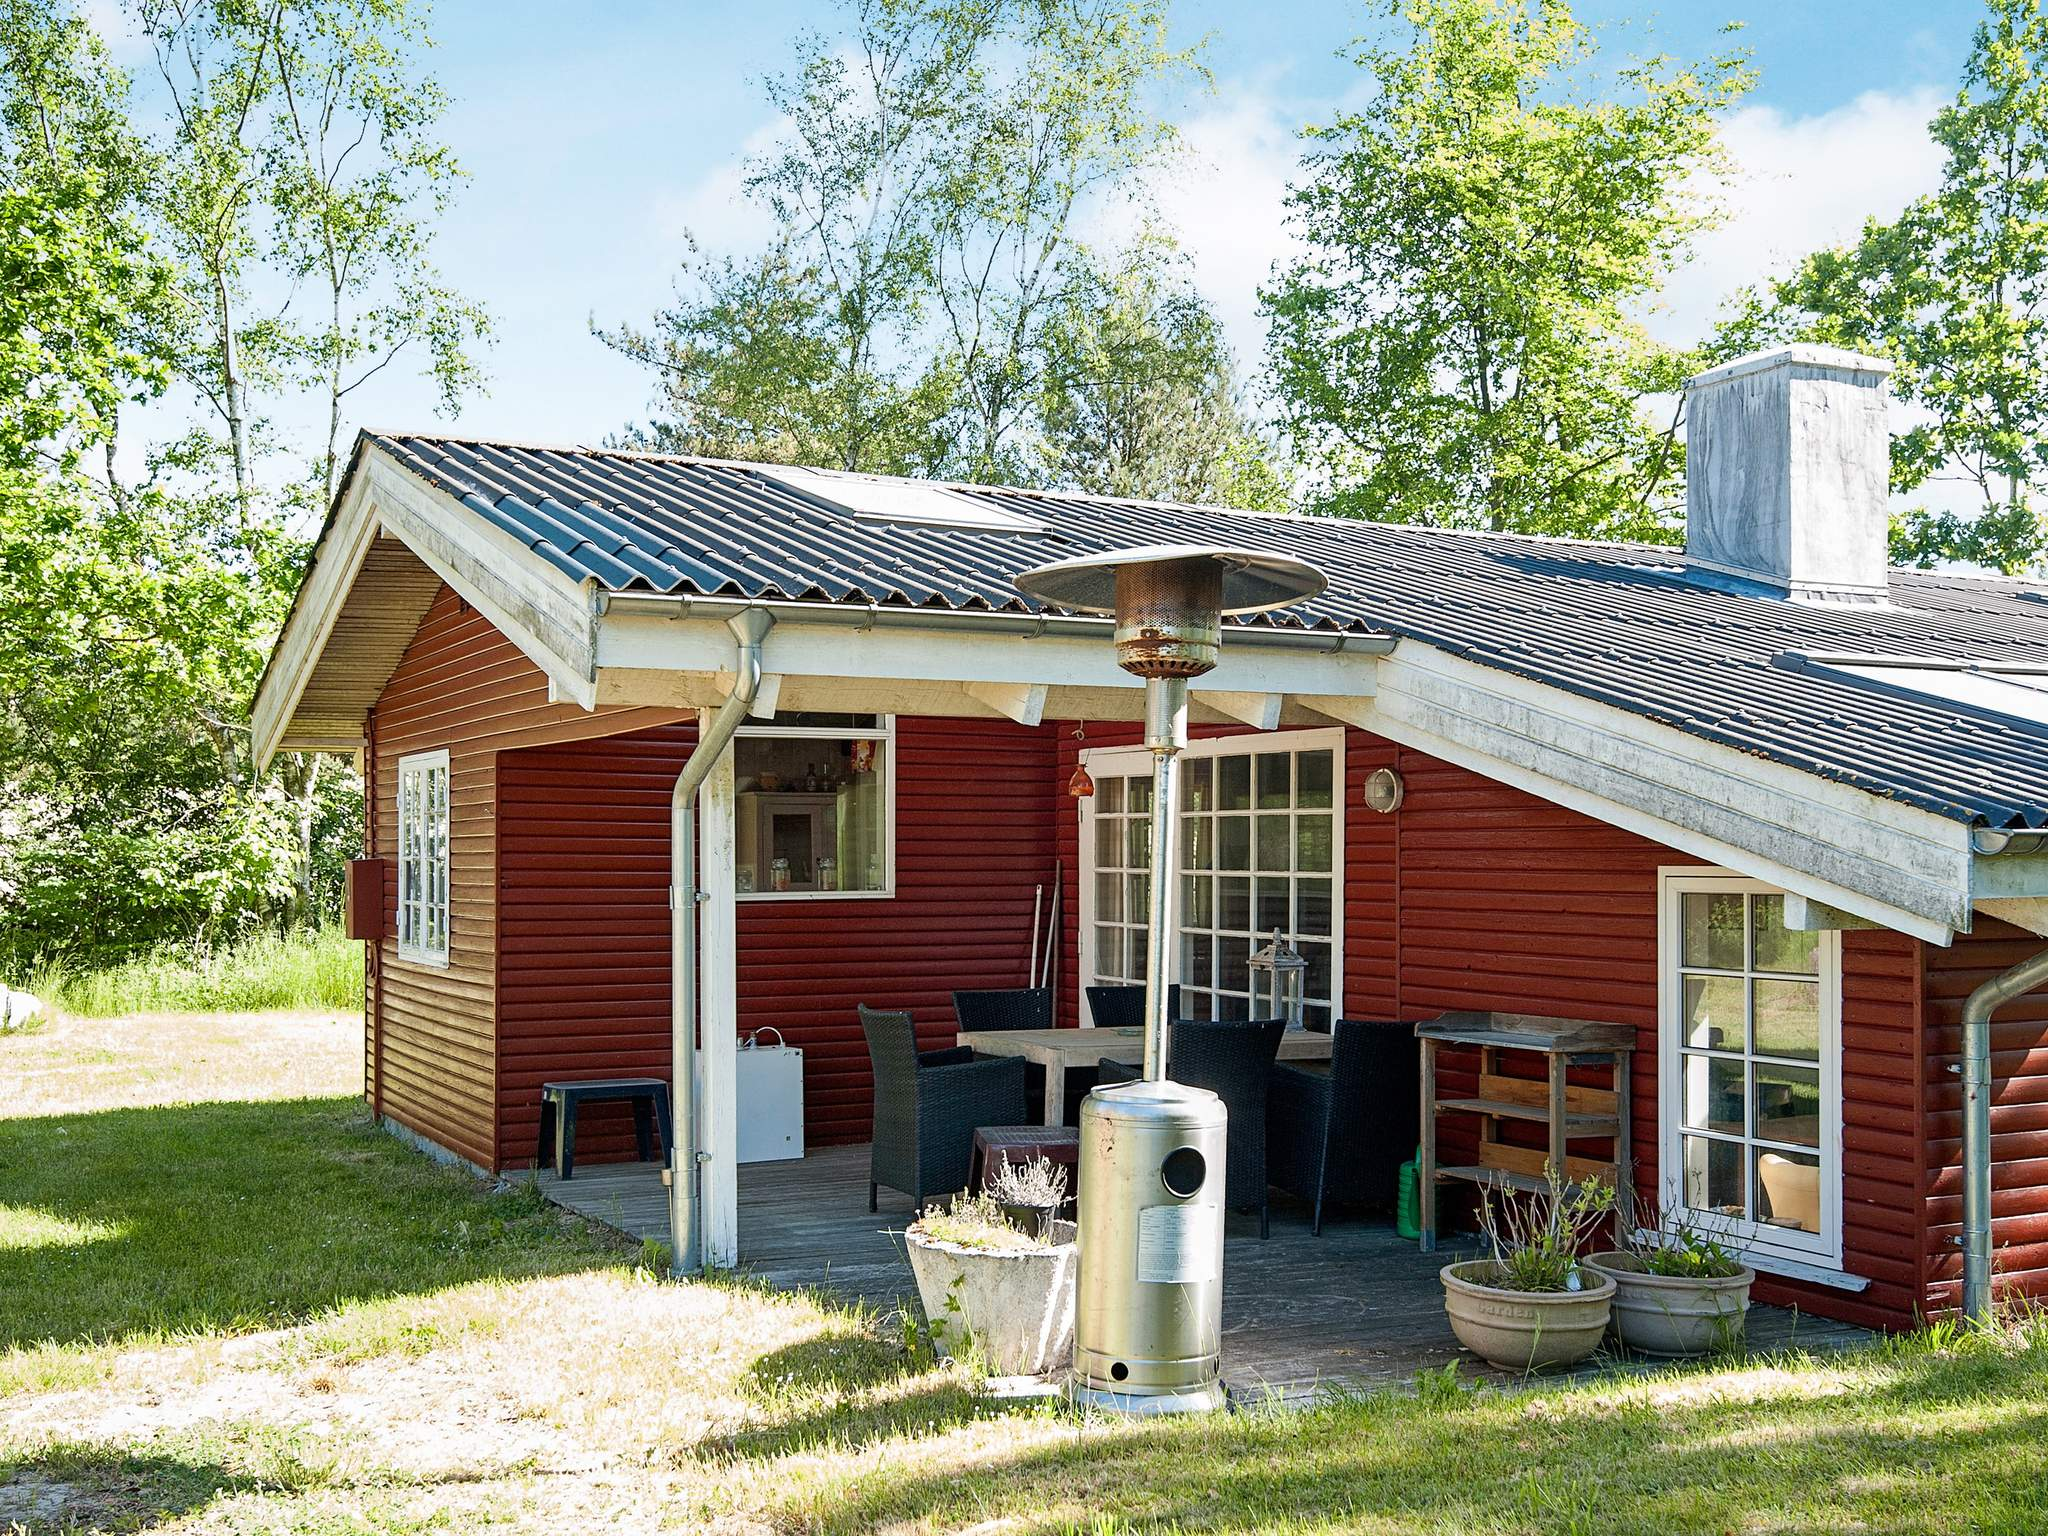 Maison de vacances Helgenæs (2354348), Knebel, , Mer Baltique danoise, Danemark, image 12